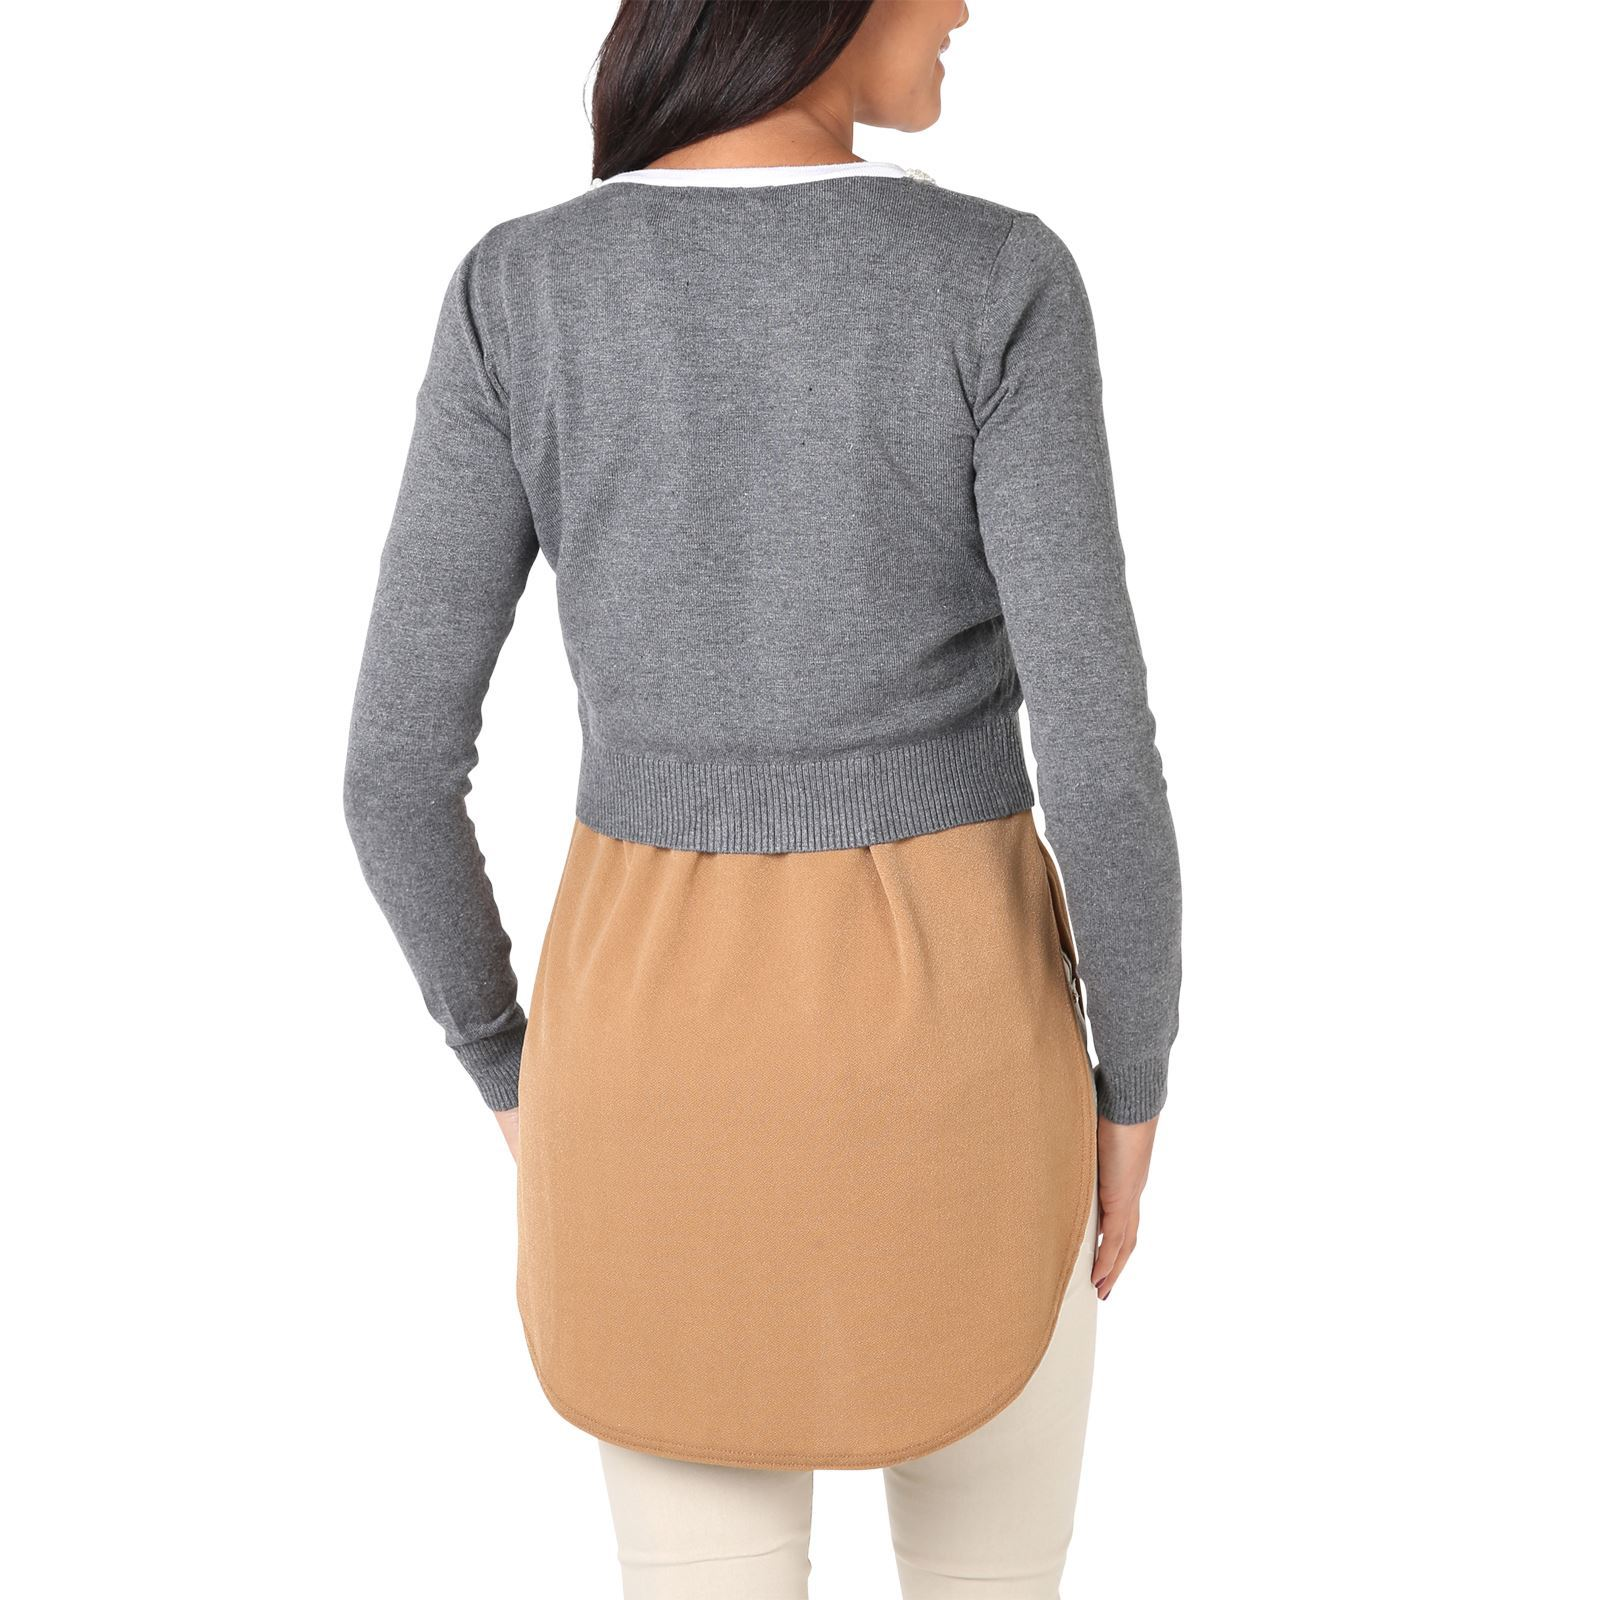 Womens-Ladies-Bolero-Shrug-Silky-Soft-Cardigan-Long-Sleeve-Knit-Short-Top-Work thumbnail 12